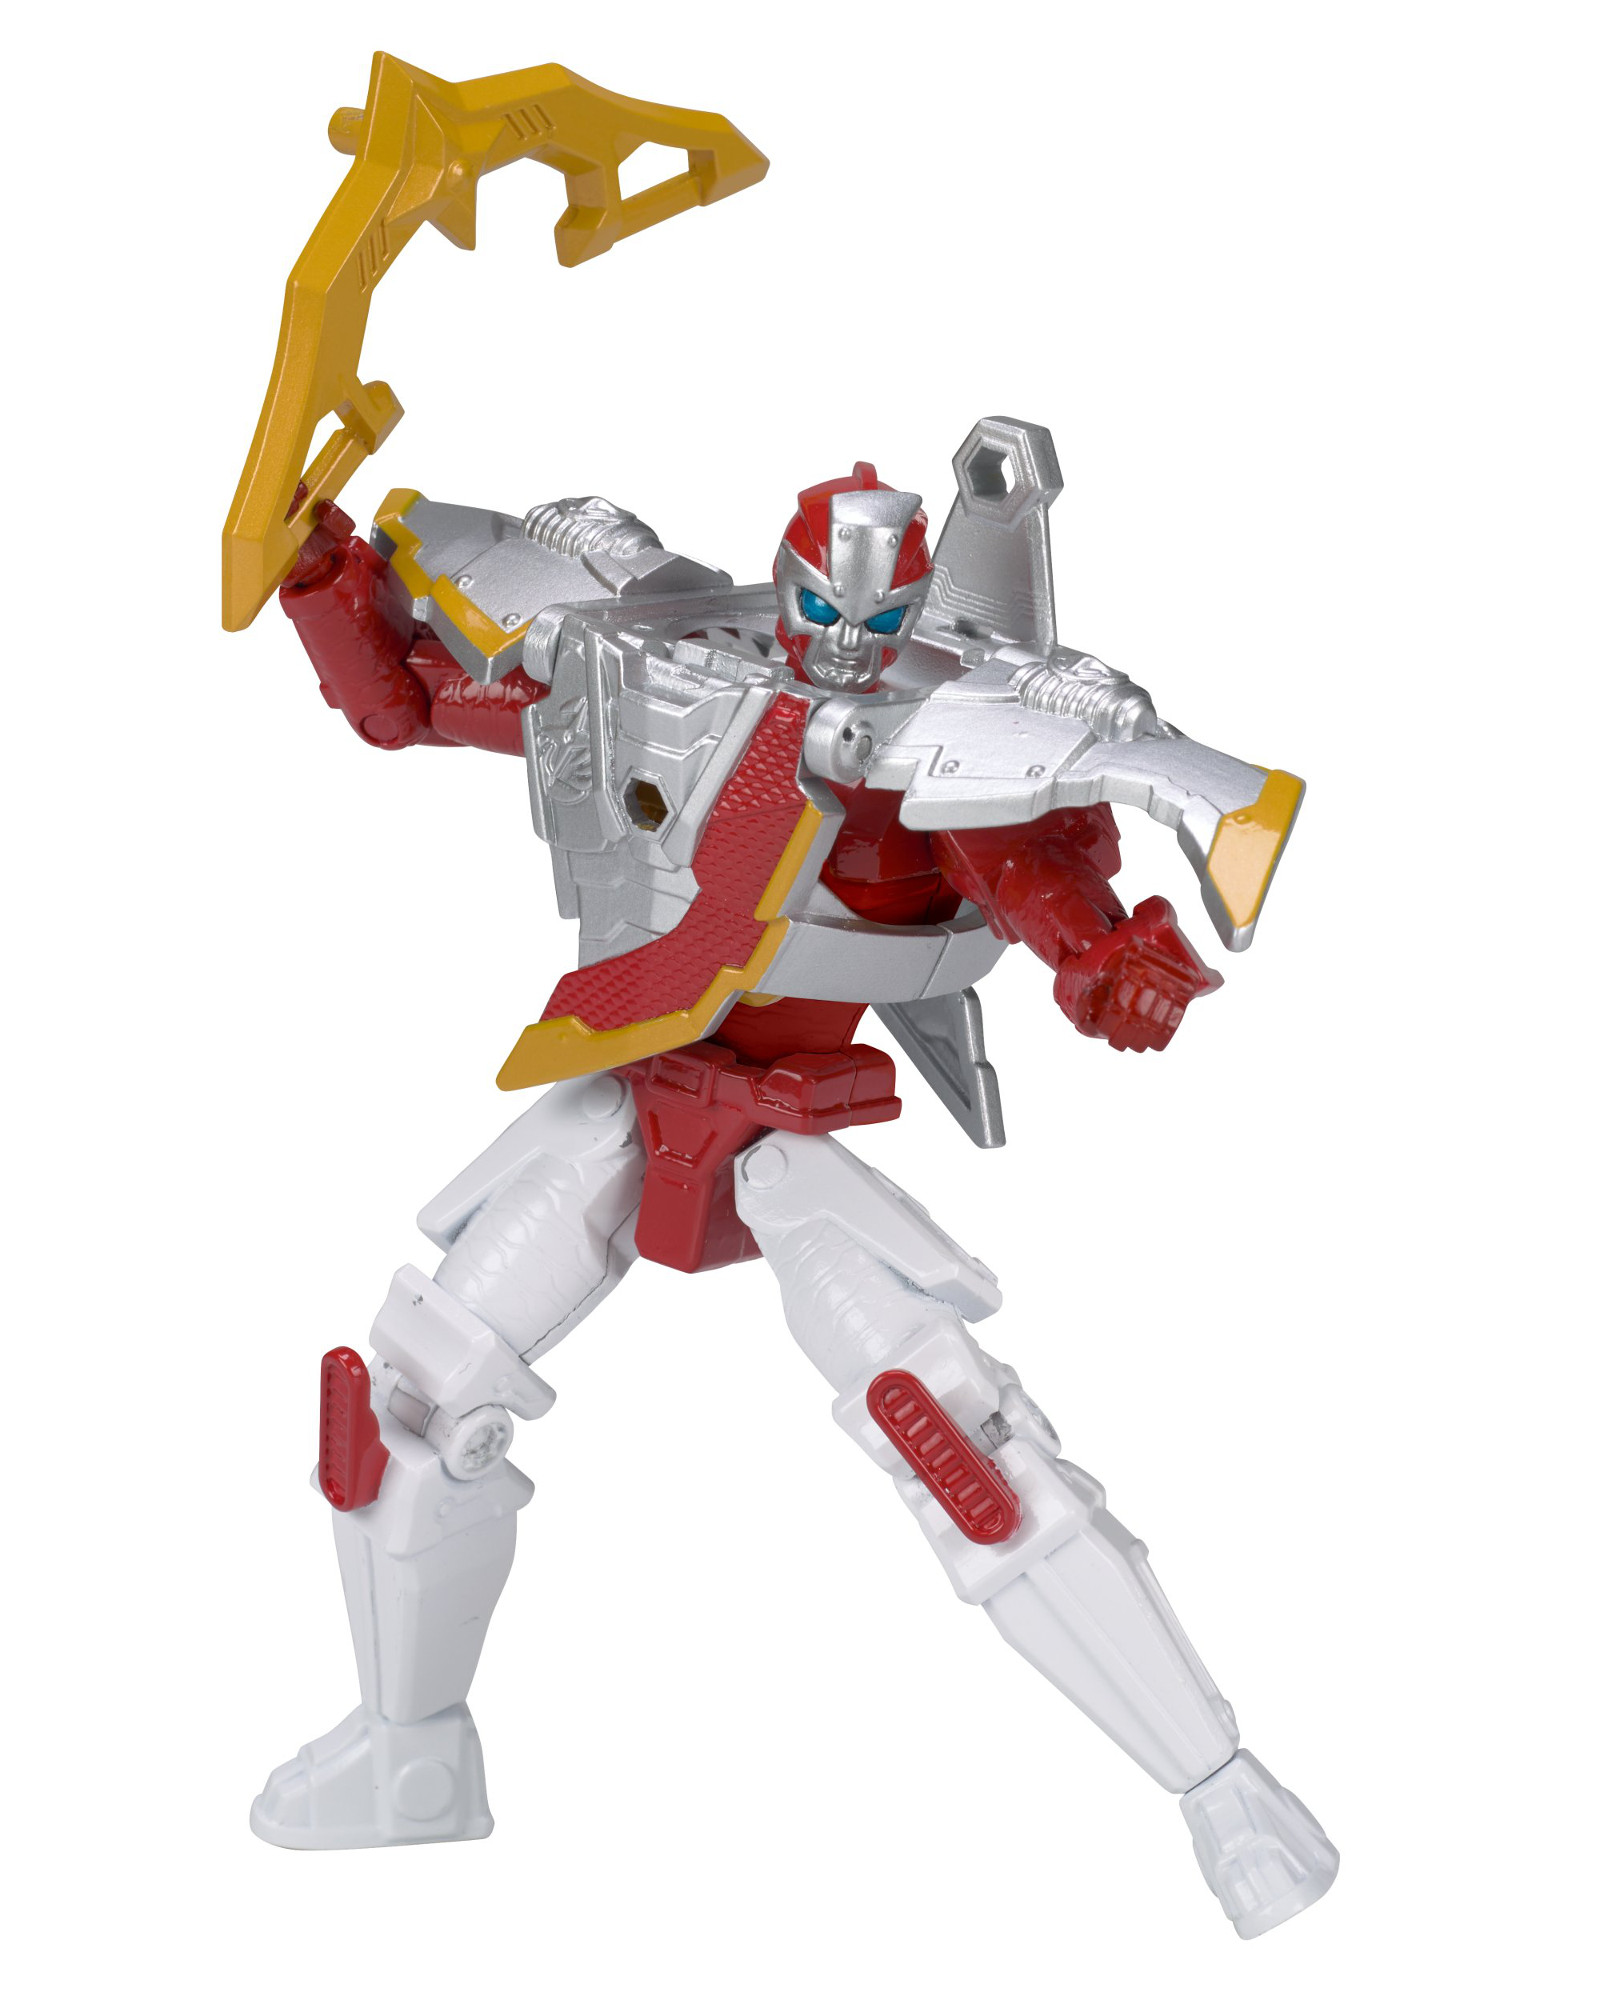 Power Rangers,Bandai Power Rangers Ninja Steel Mega Morph Robo 5 inch Action Figure - Red Zord PartNumber: 004W003474513005P